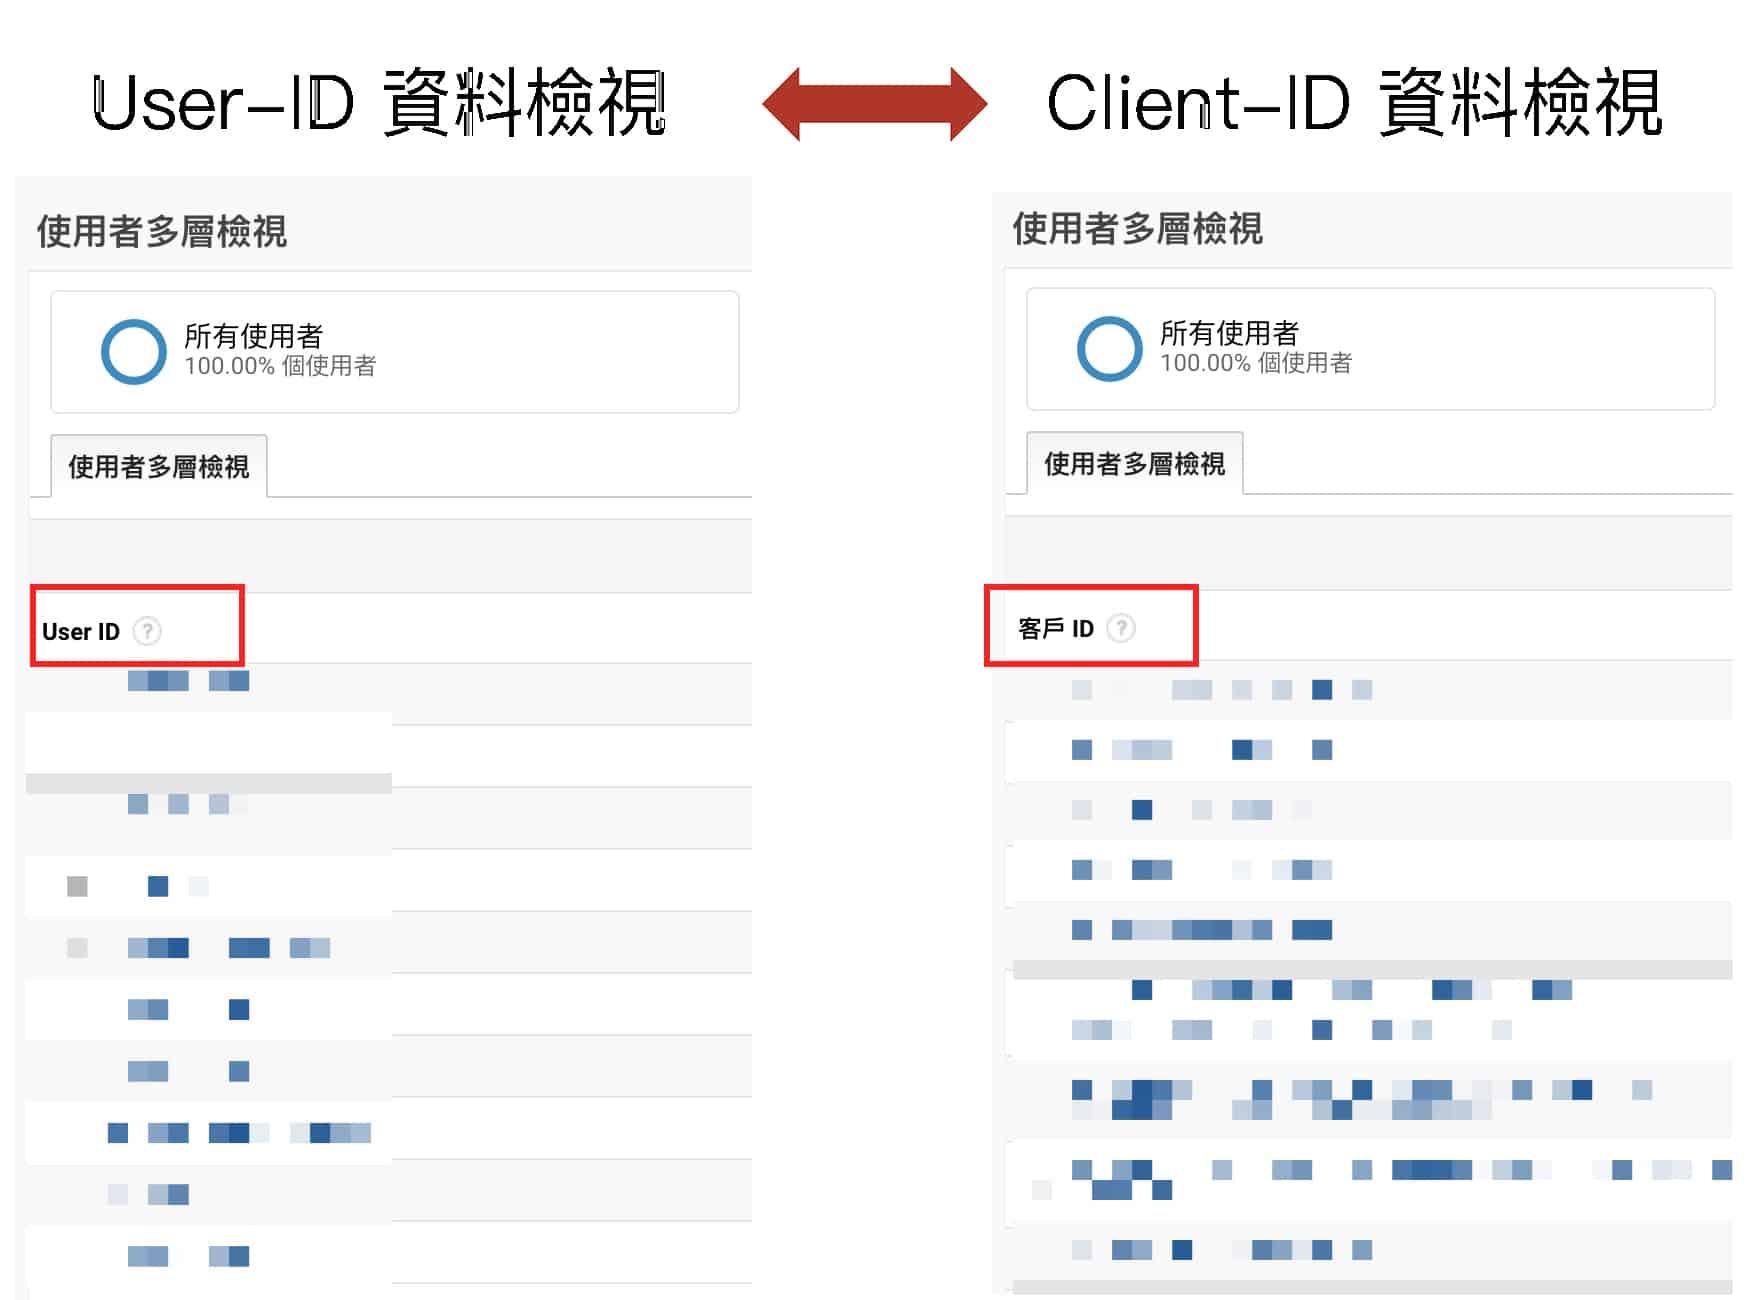 GA Client ID vs GA USER ID